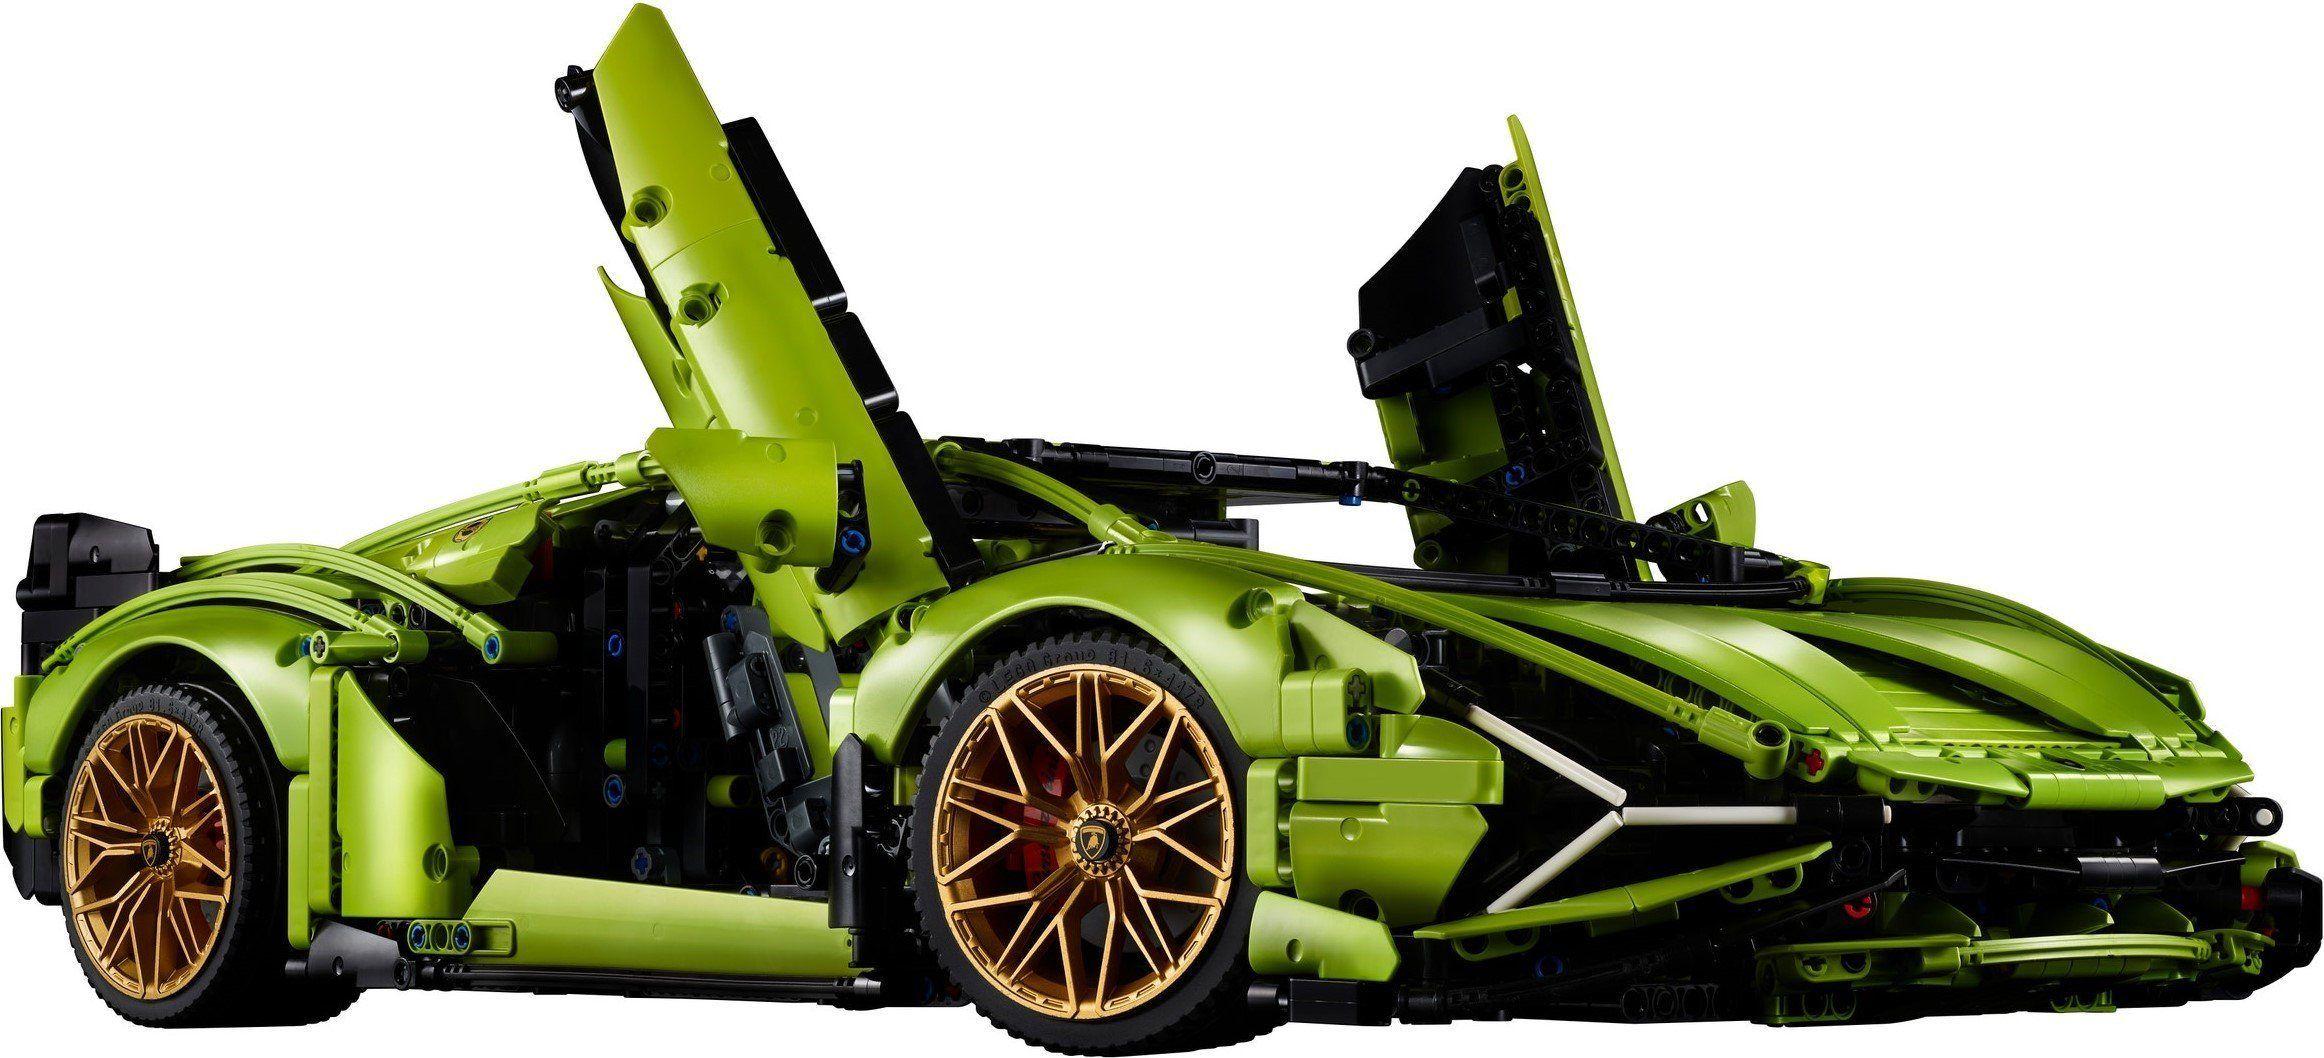 [Vorbestellung] LEGO Lamborghini Sián FKP 37 (Modell 42115, 3696 Teile, mit Prints)